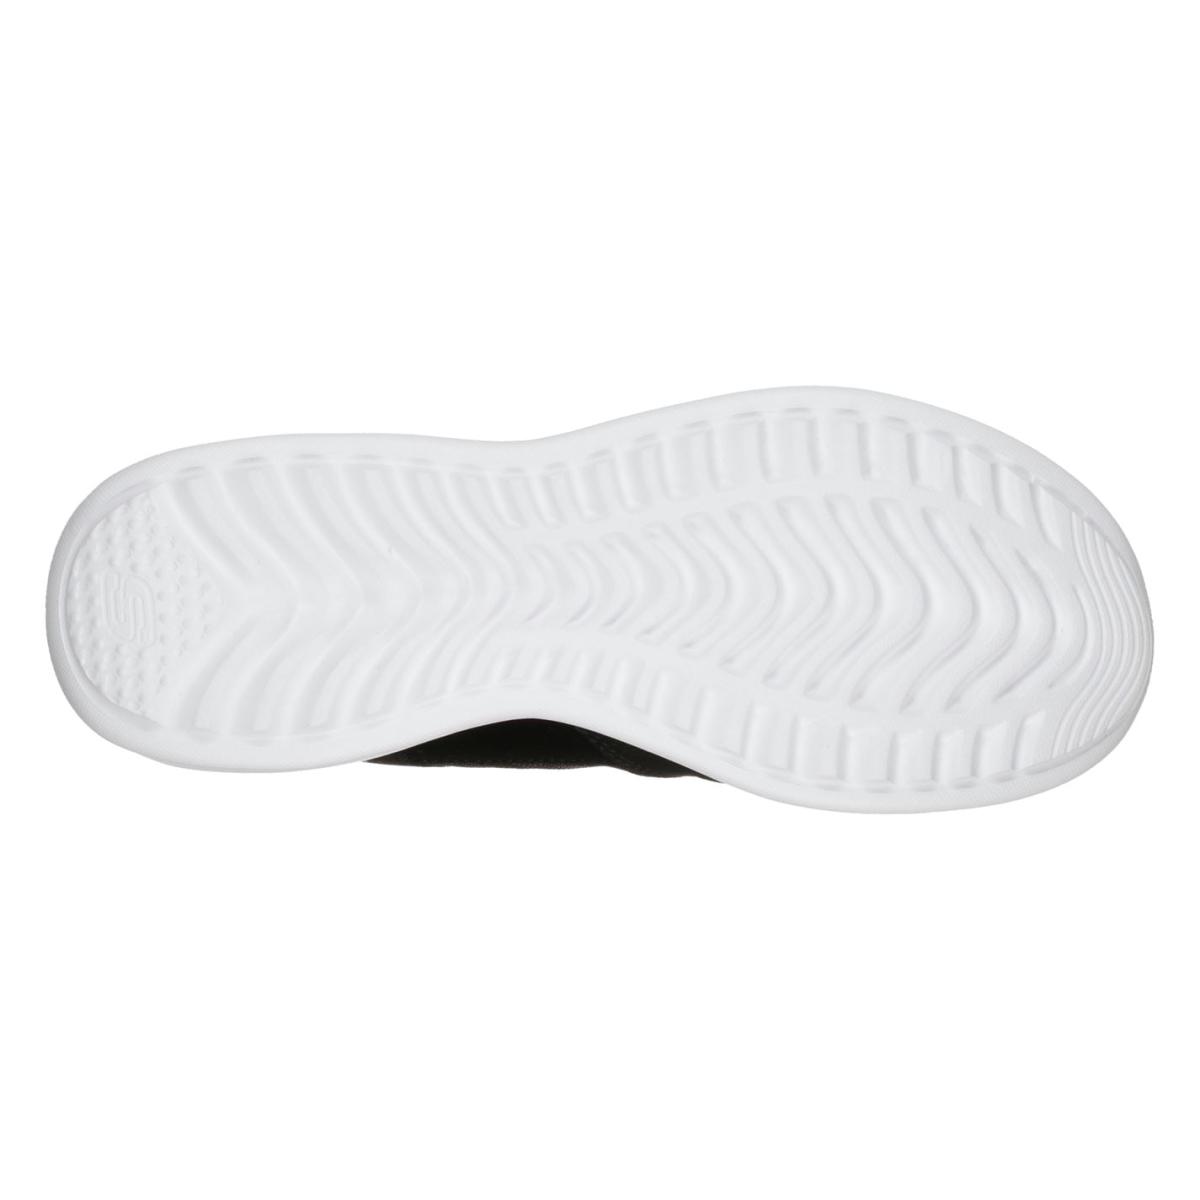 Skechers-Skybound-Turnschuhe-Laufschuhe-Damen-Sportschuhe-Sneaker-1398 Indexbild 3